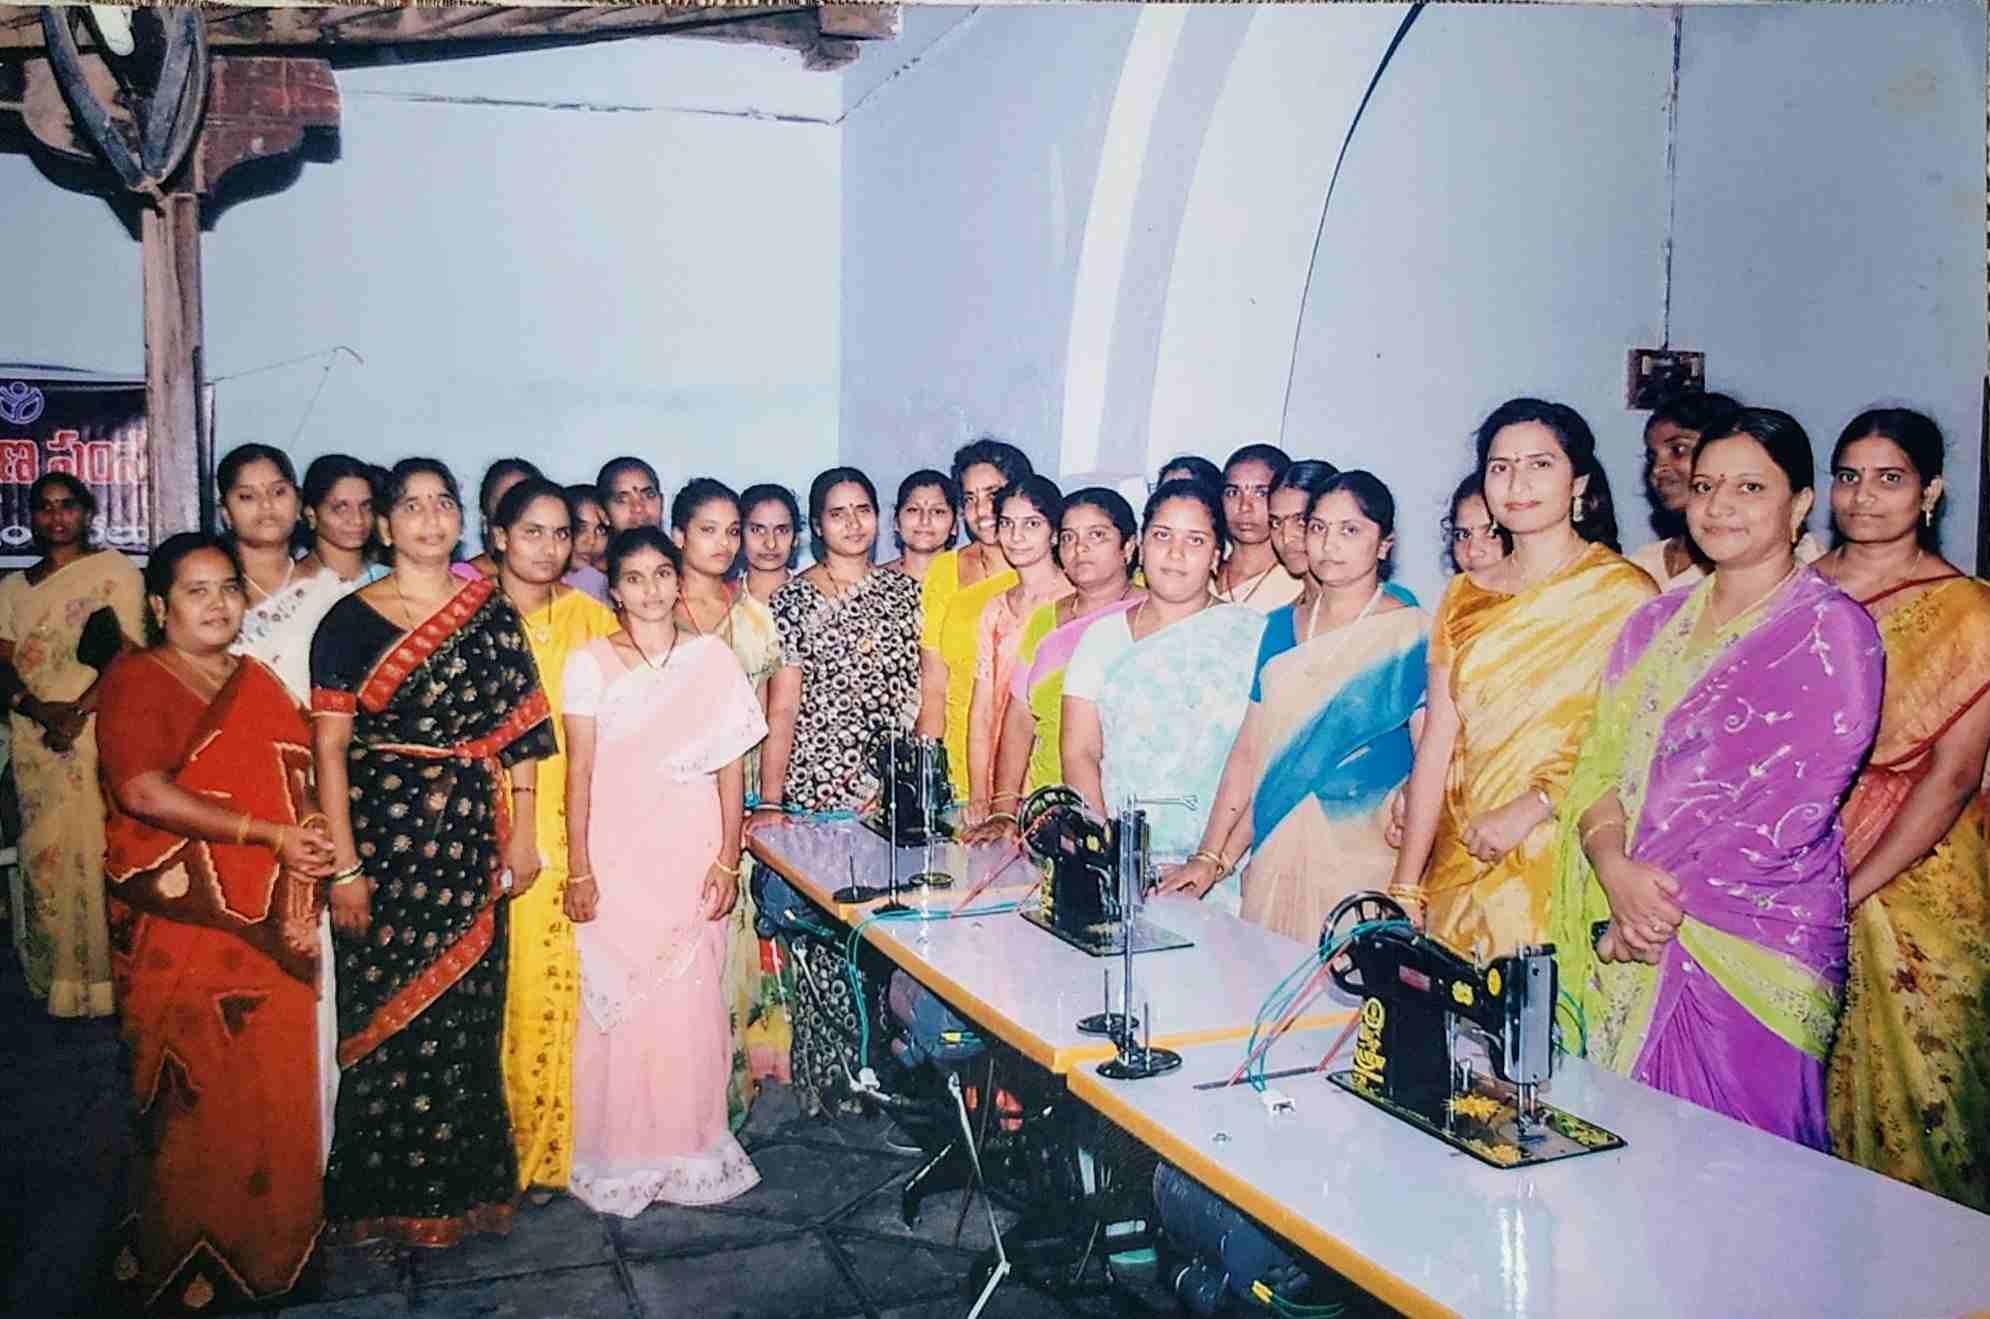 Chitturi Kanaka Durga Venkata Sunanda | YSRCP Senior Leader | YSRCP | Congress | ZPTC Member | Sarpanch |  AMC Member | AMC Chair Person | Velpuru | Tanuku | West Godavari | Andhra Pradesh | theLeadersPage